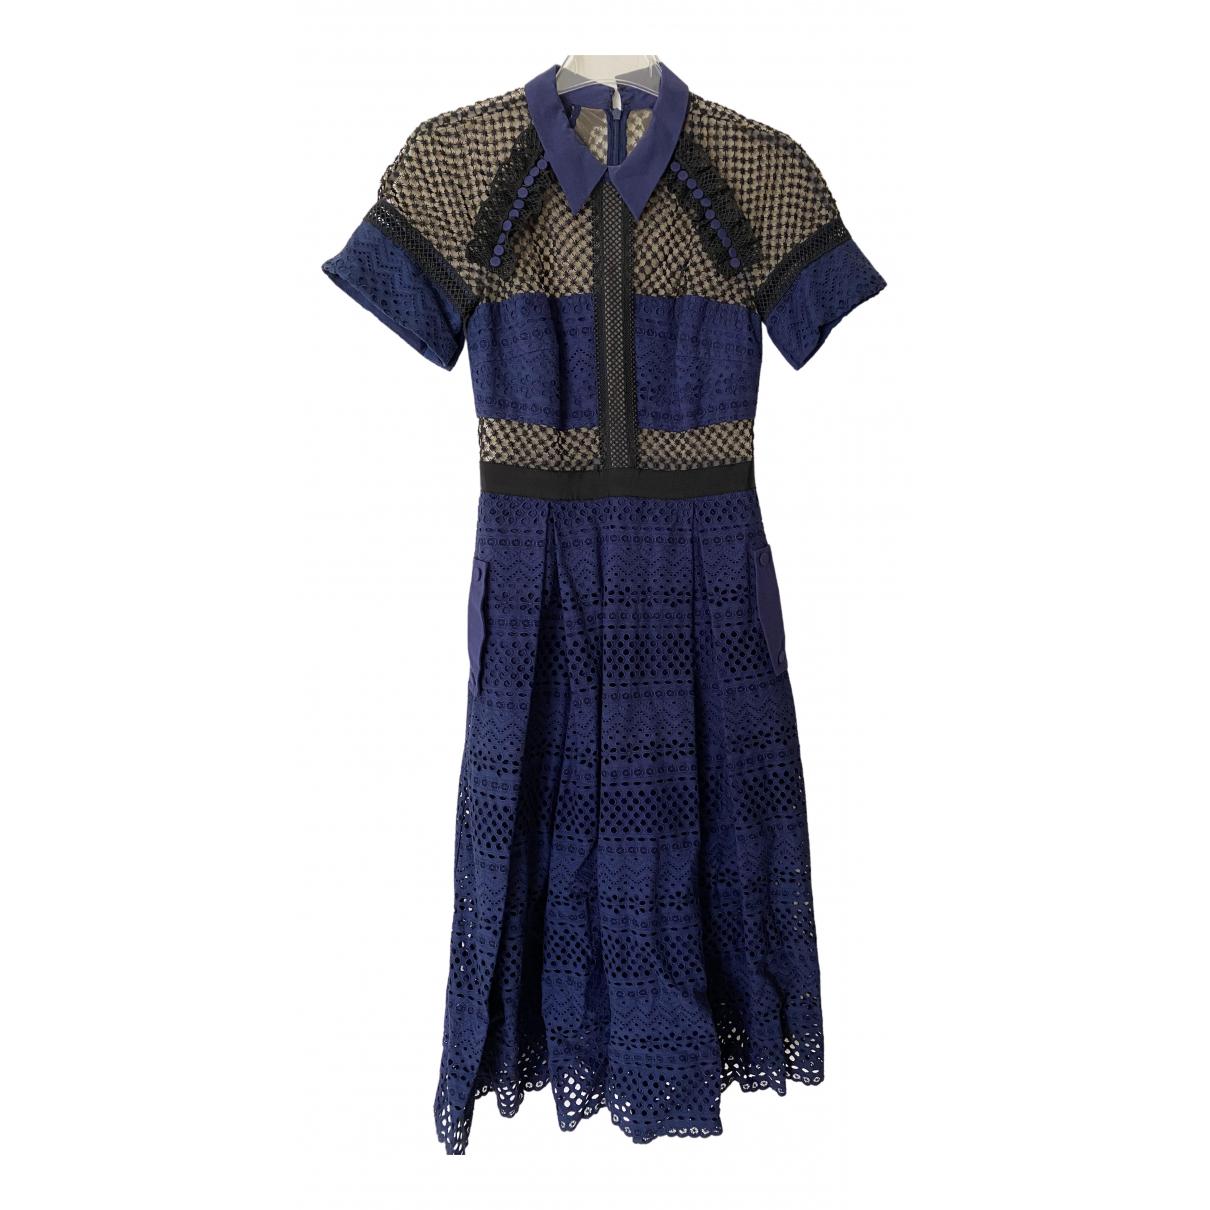 Self Portrait \N Blue Cotton dress for Women 8 UK